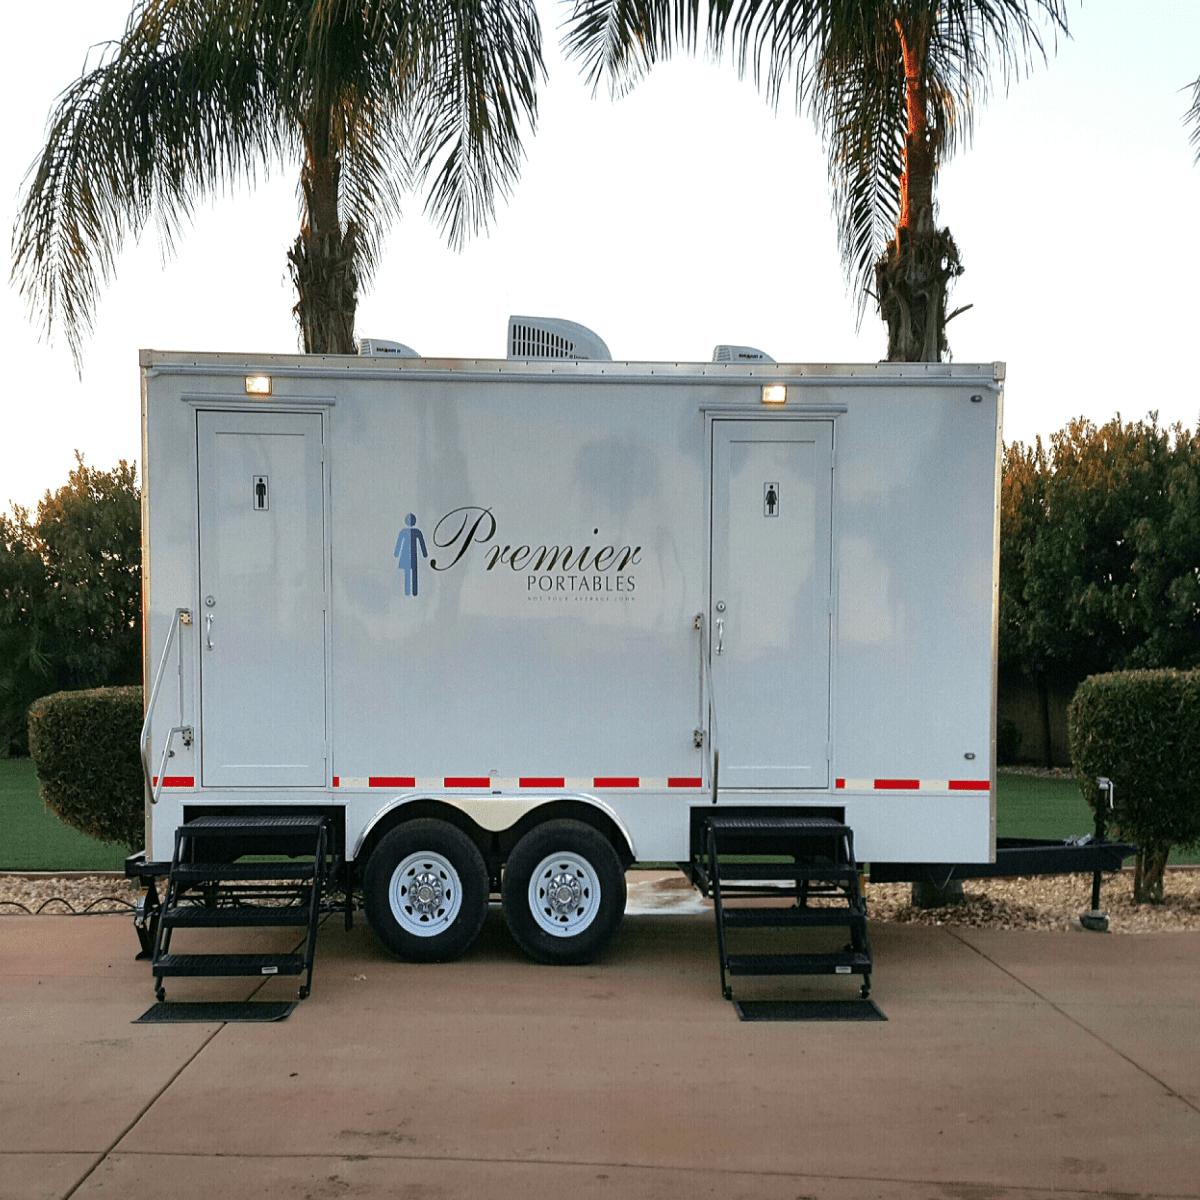 Portable Restroom Trailers In Chico, California | Premier Portables